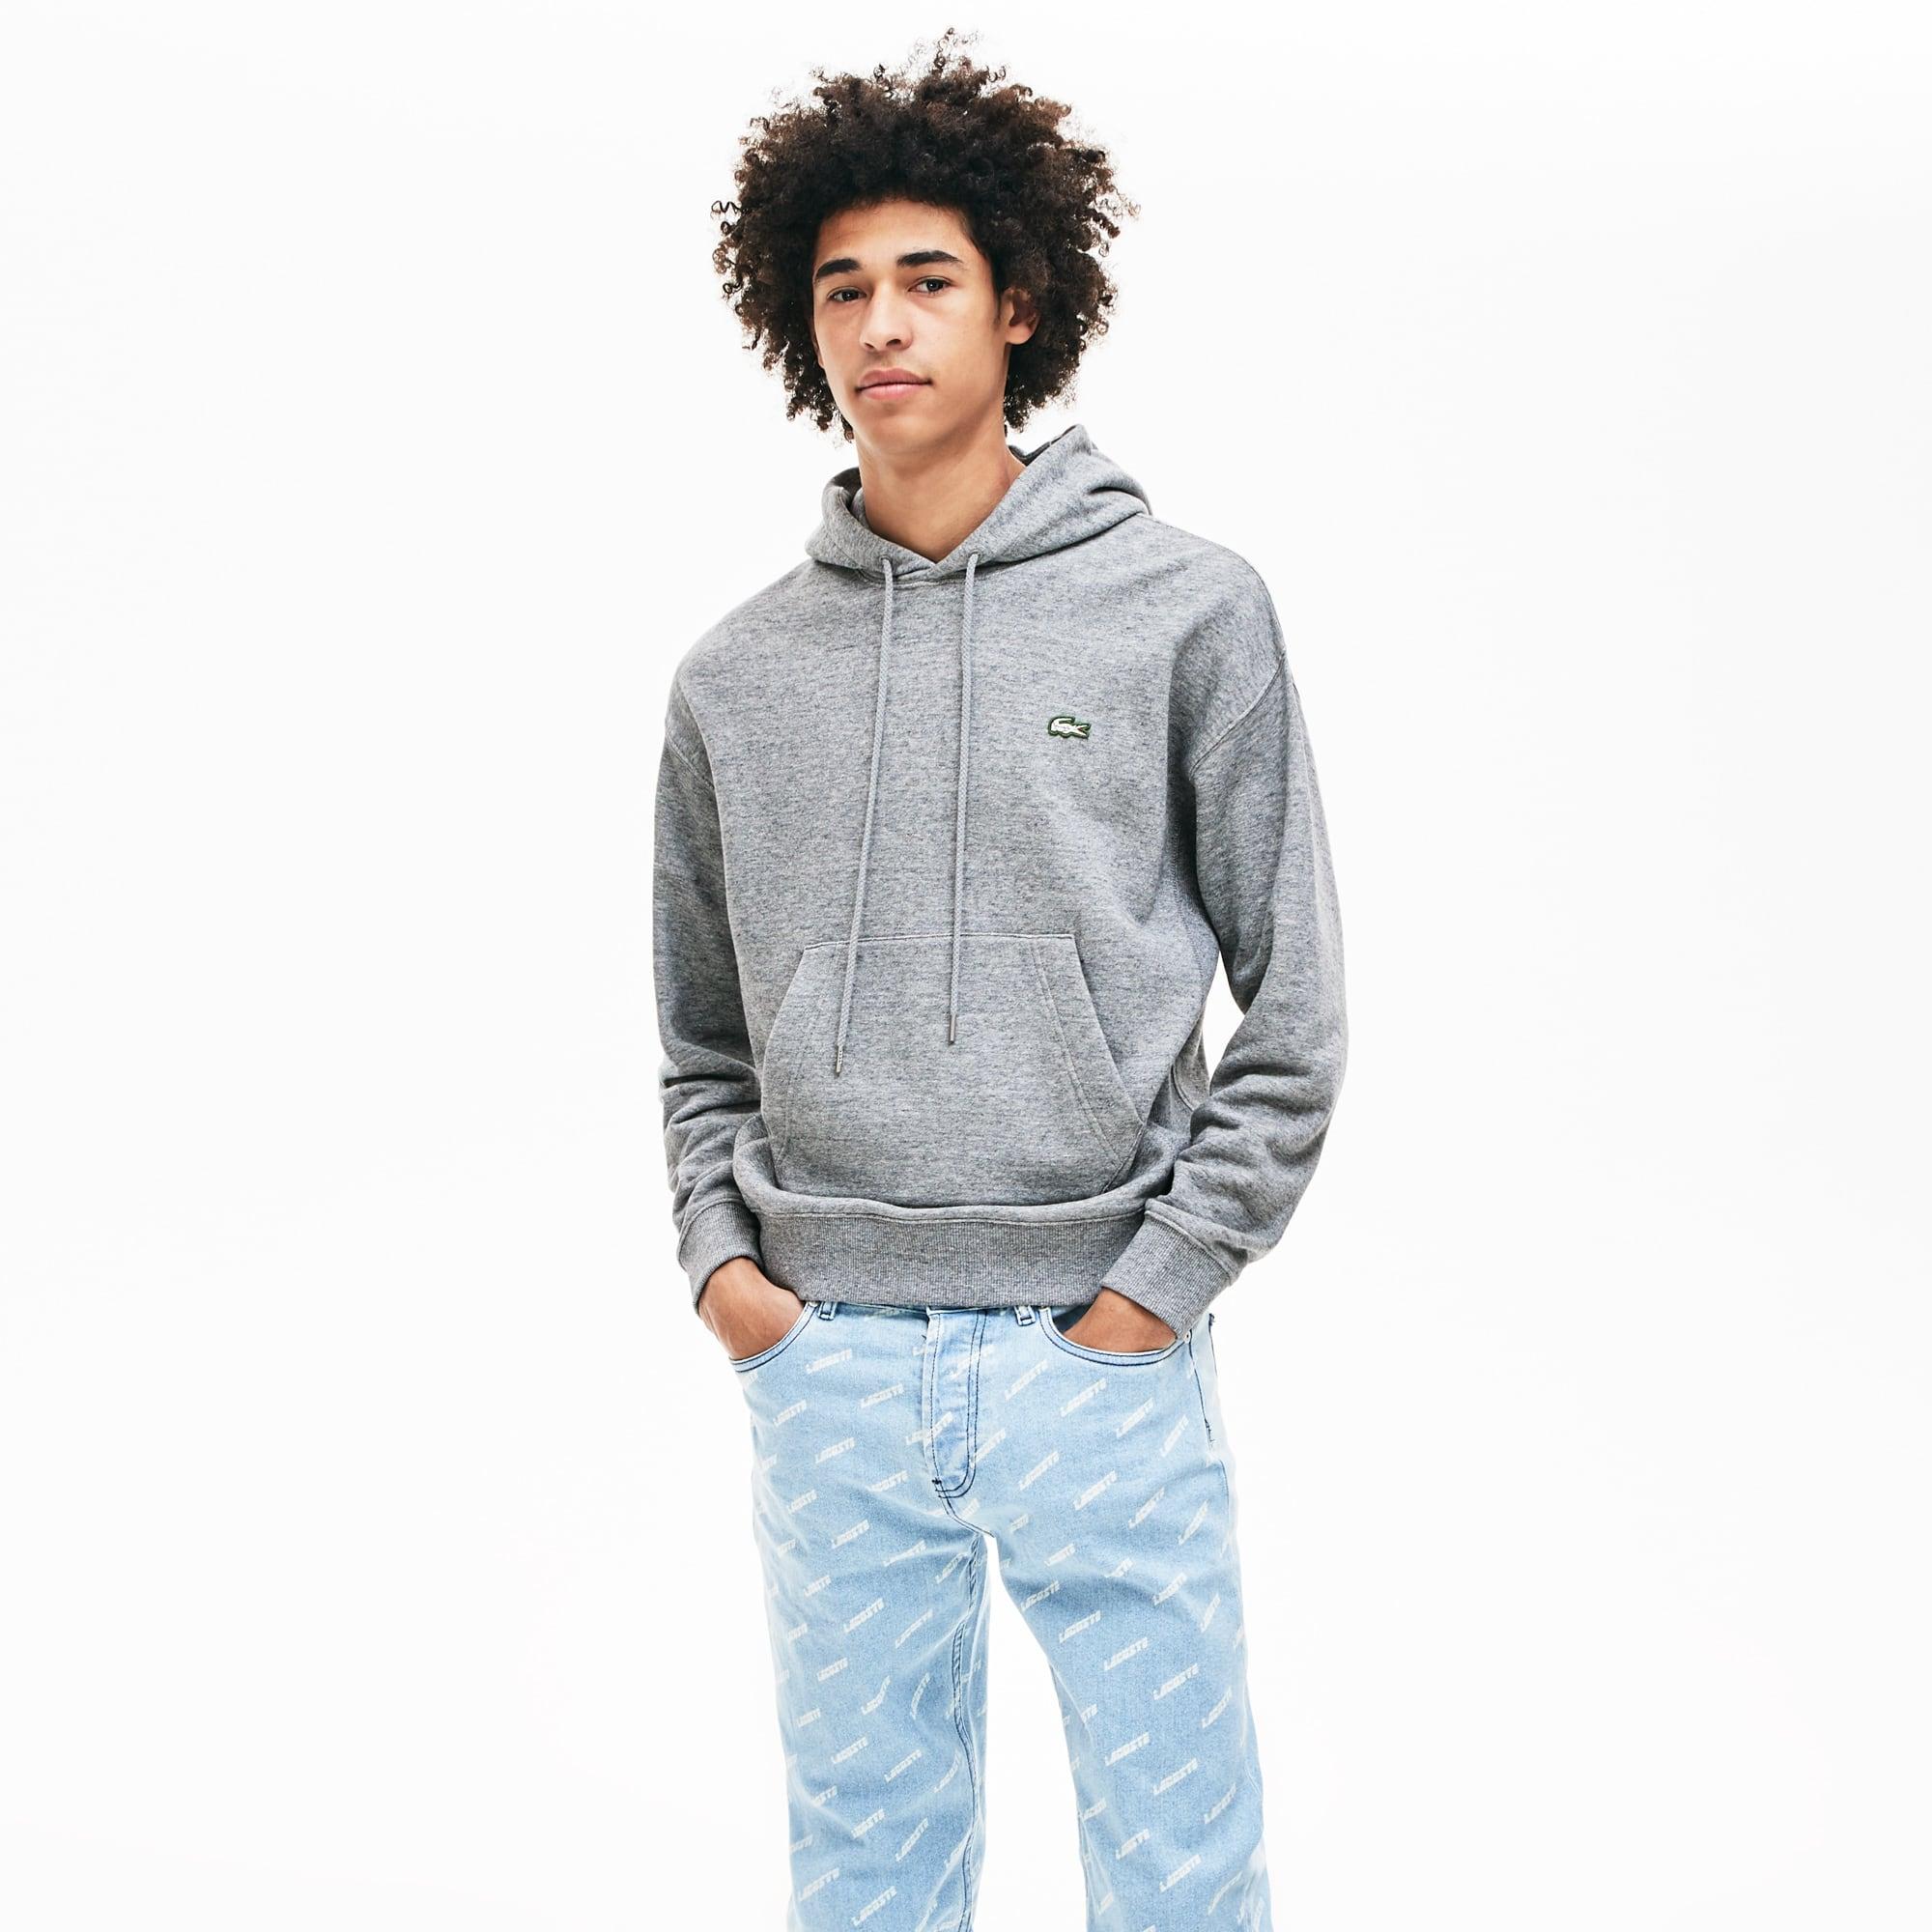 Unisex Live Sweatshirt Lacoste Cotton Hooded rdCxohBtsQ